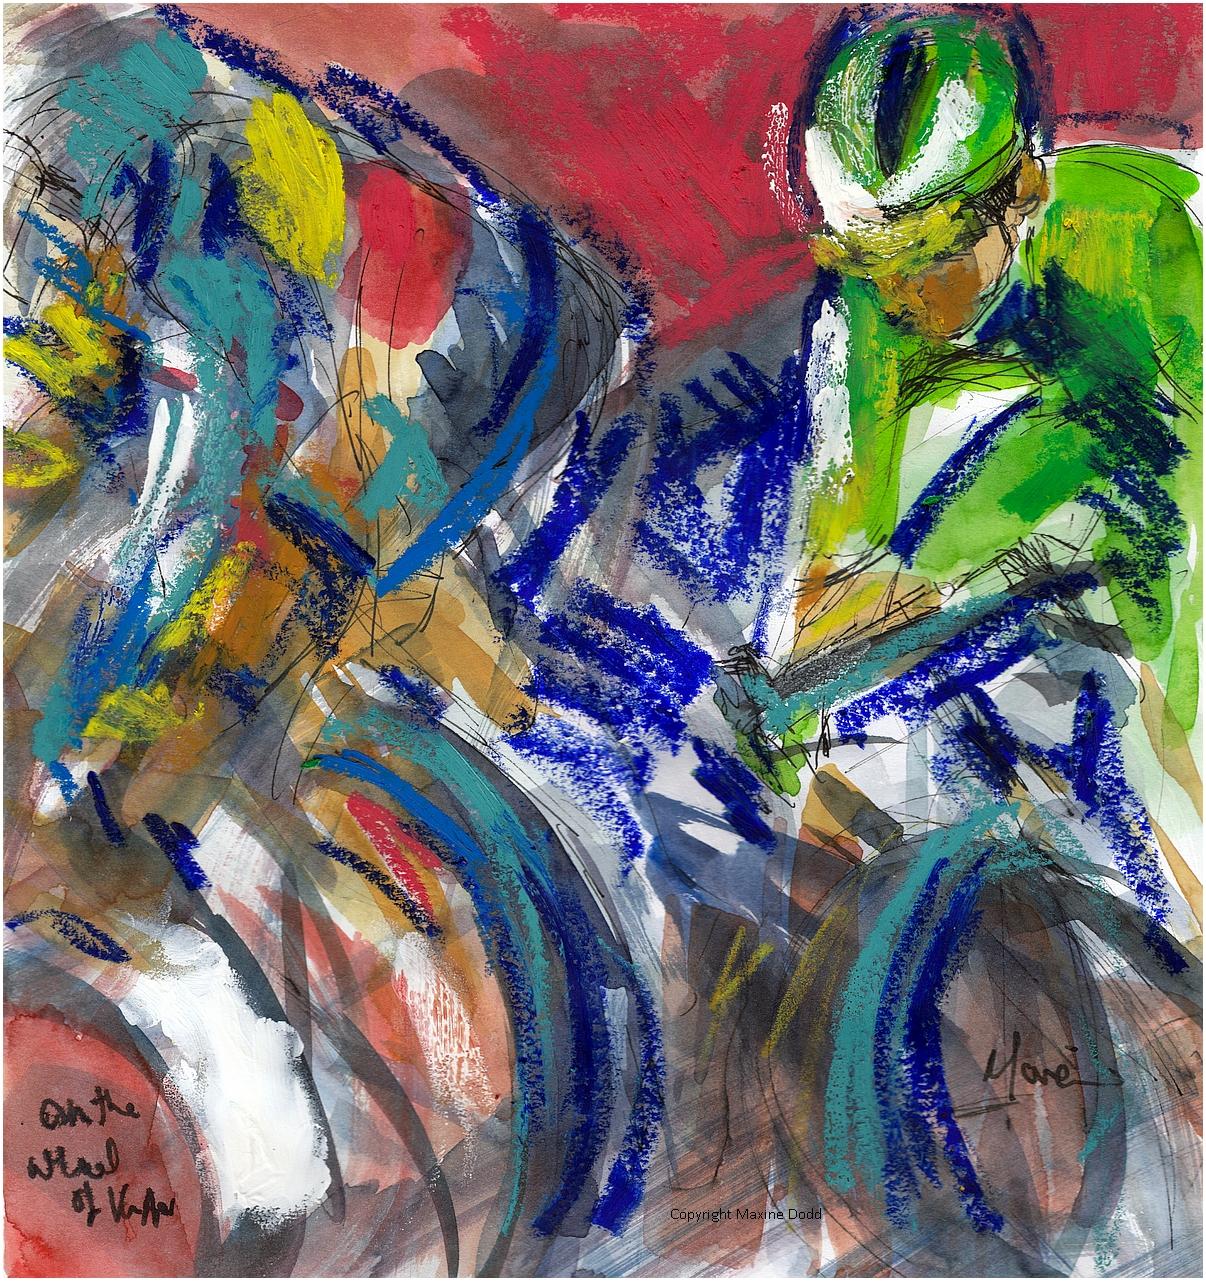 Tour de France 2021 - Stage 21 - On Wout's wheels, original watercolour by Maxine Dodd